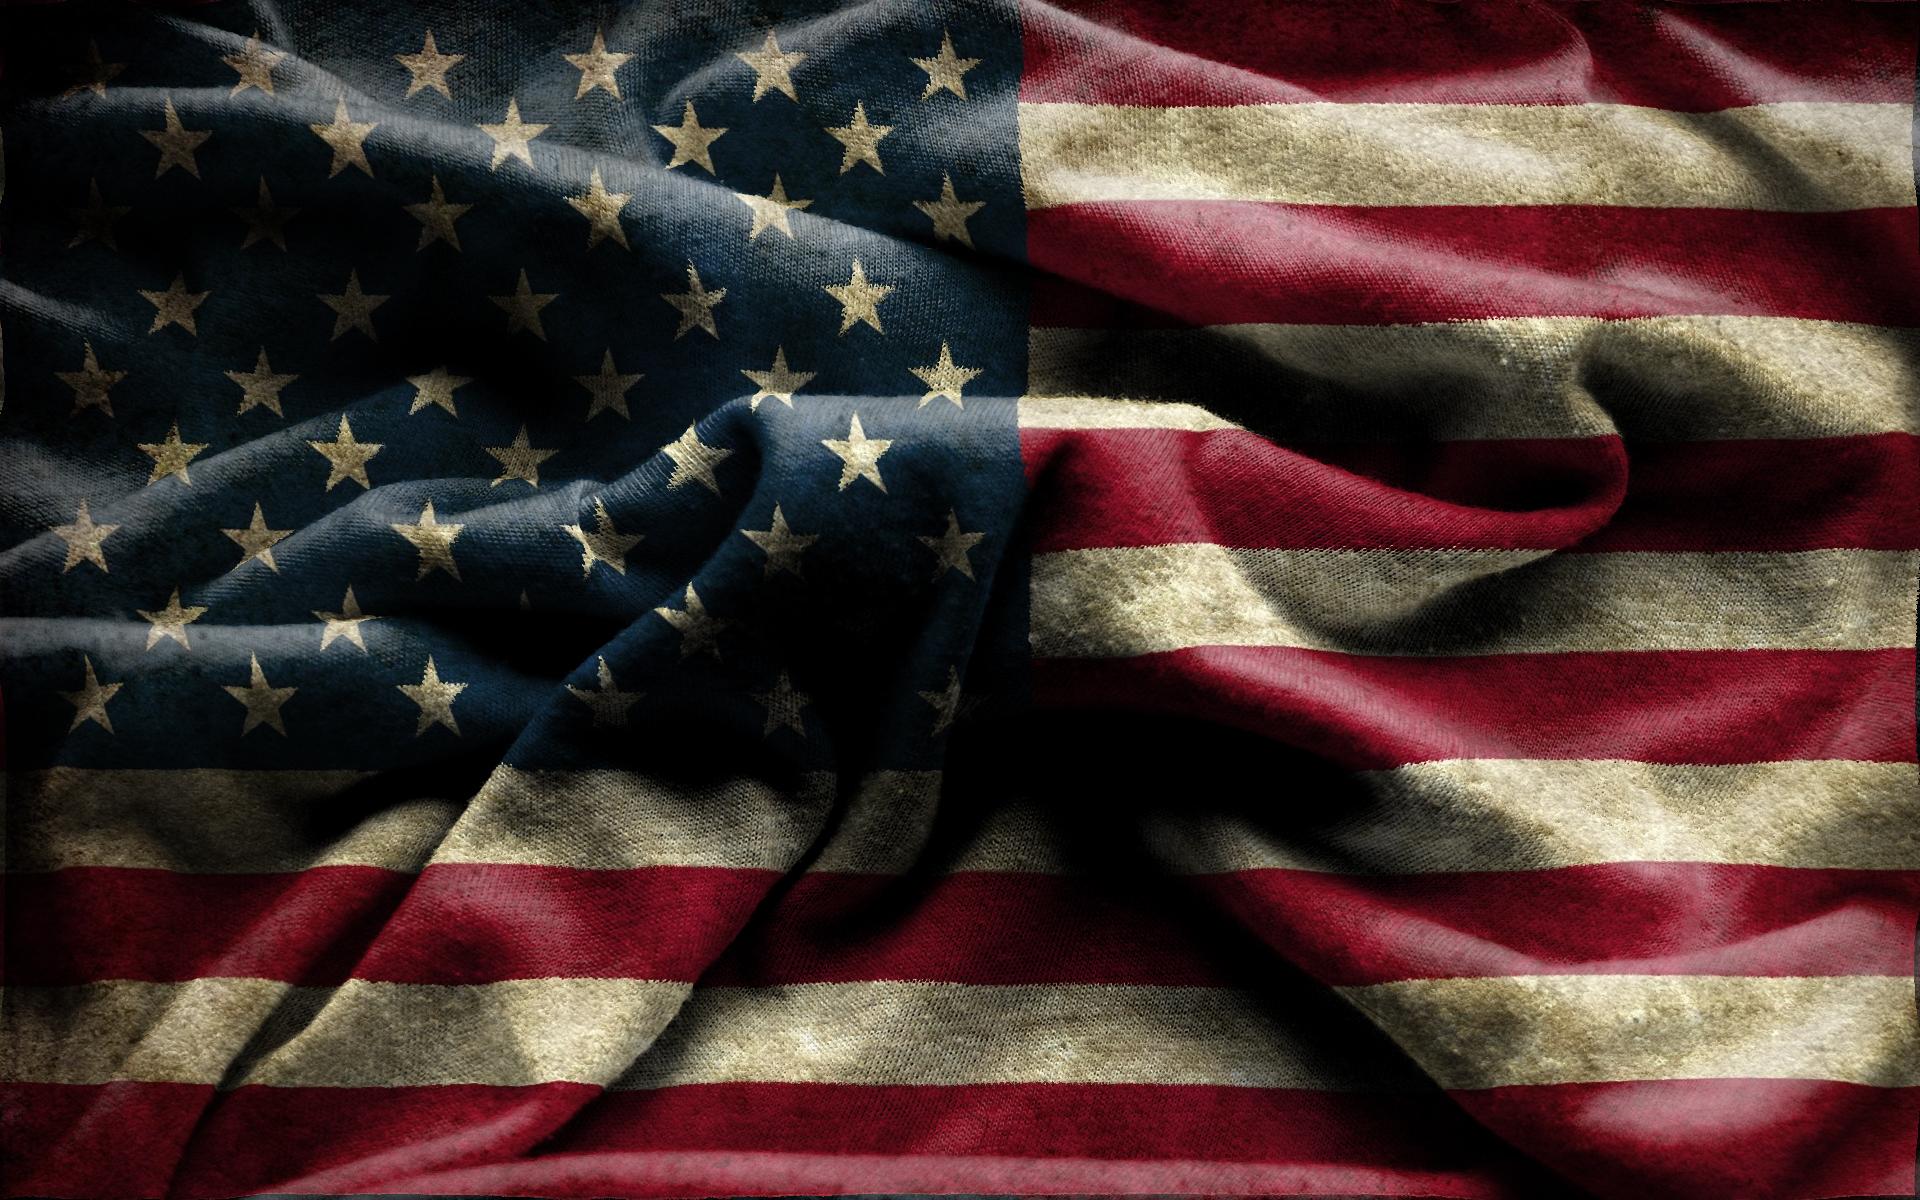 USA flag by ThePrinceDaniels 1920x1200